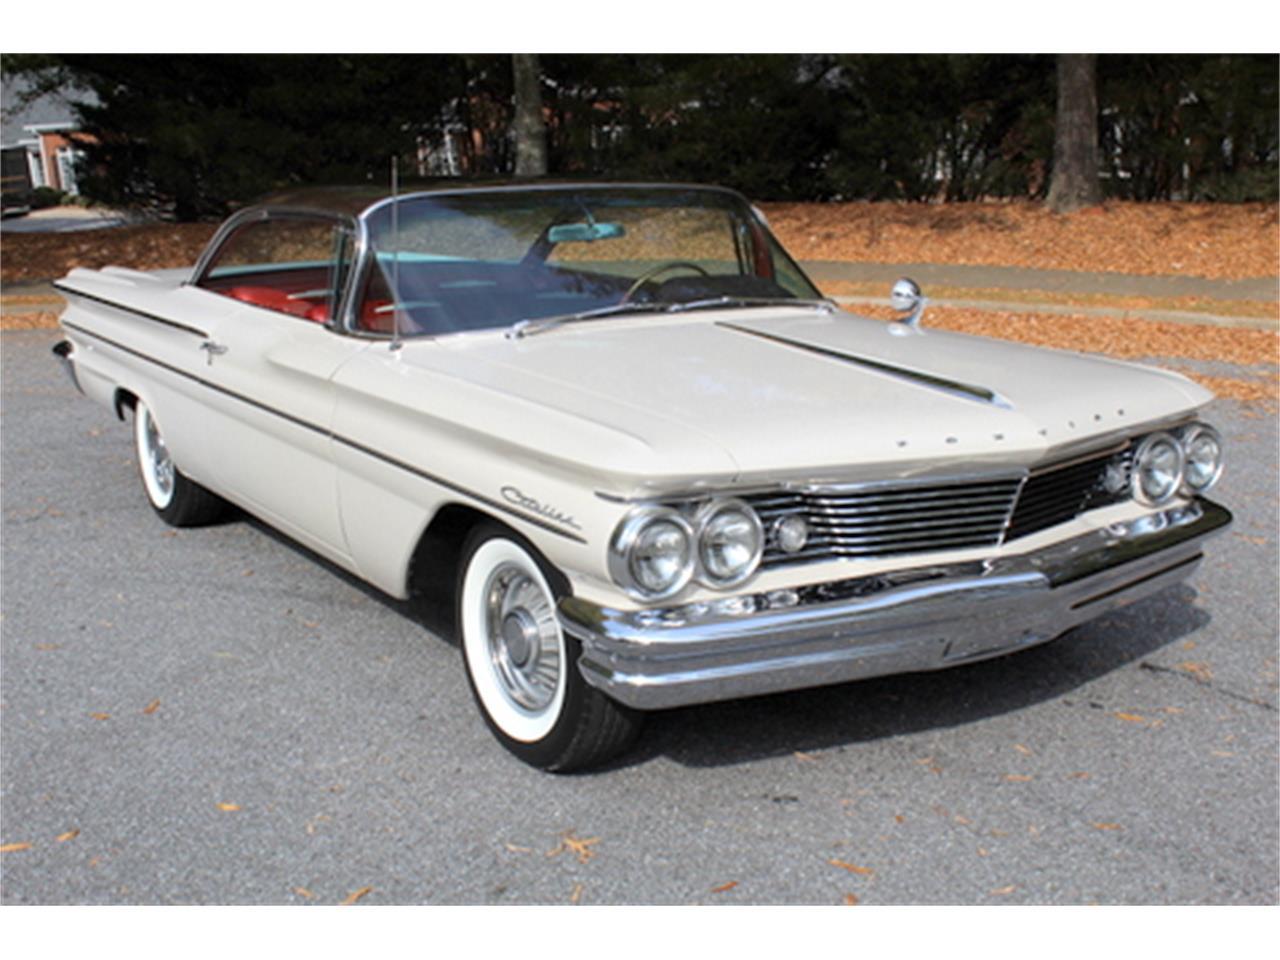 1960 Pontiac Catalina For Sale Cc 919975 Bonneville Station Wagon Large Picture Of 60 Jpuv